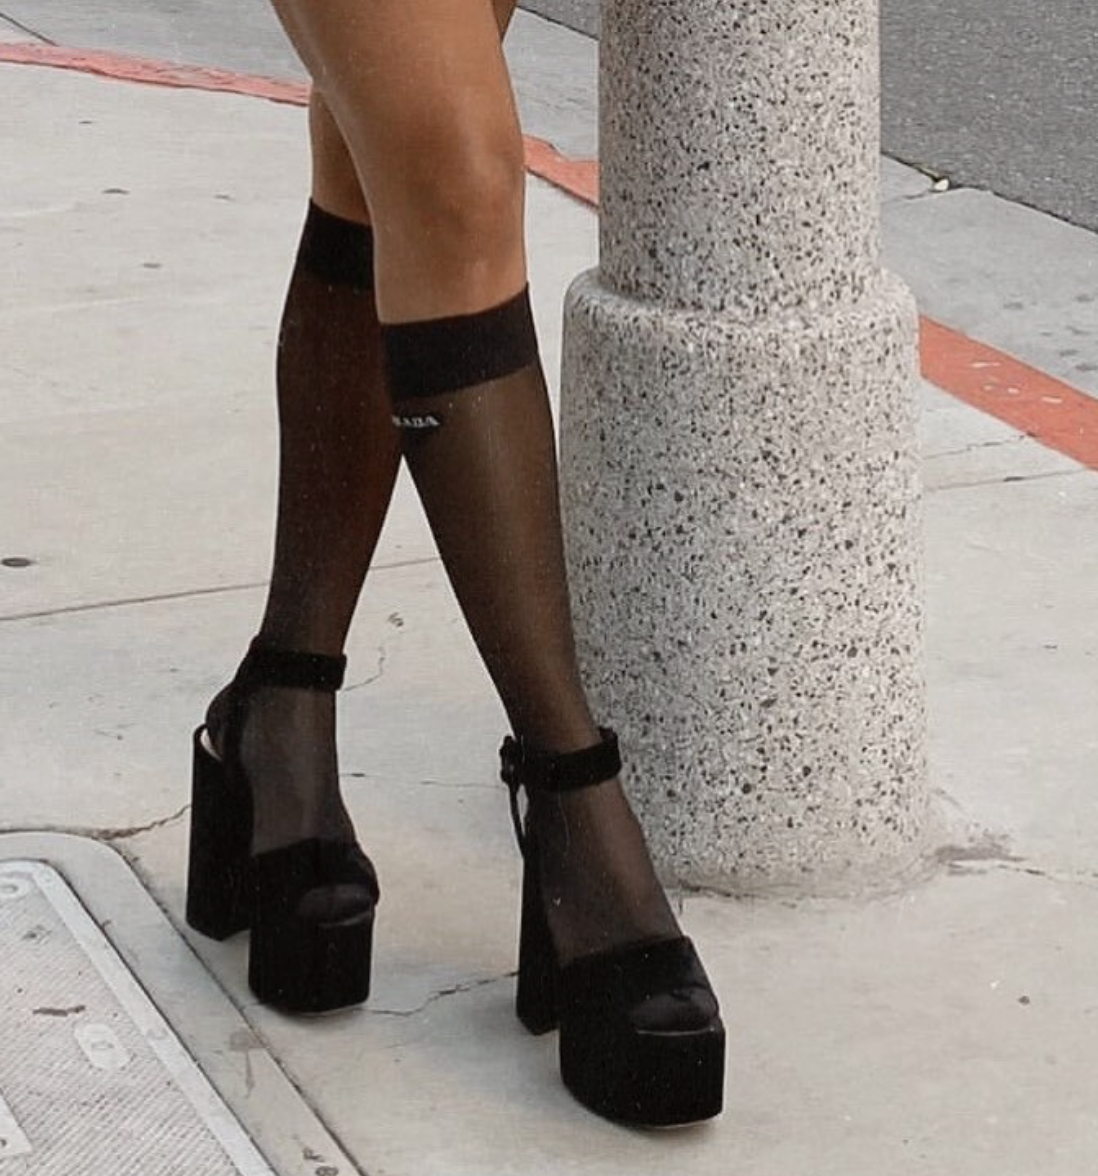 sinqlrty   Miu miu heels, Heels, Aesthetic shoes